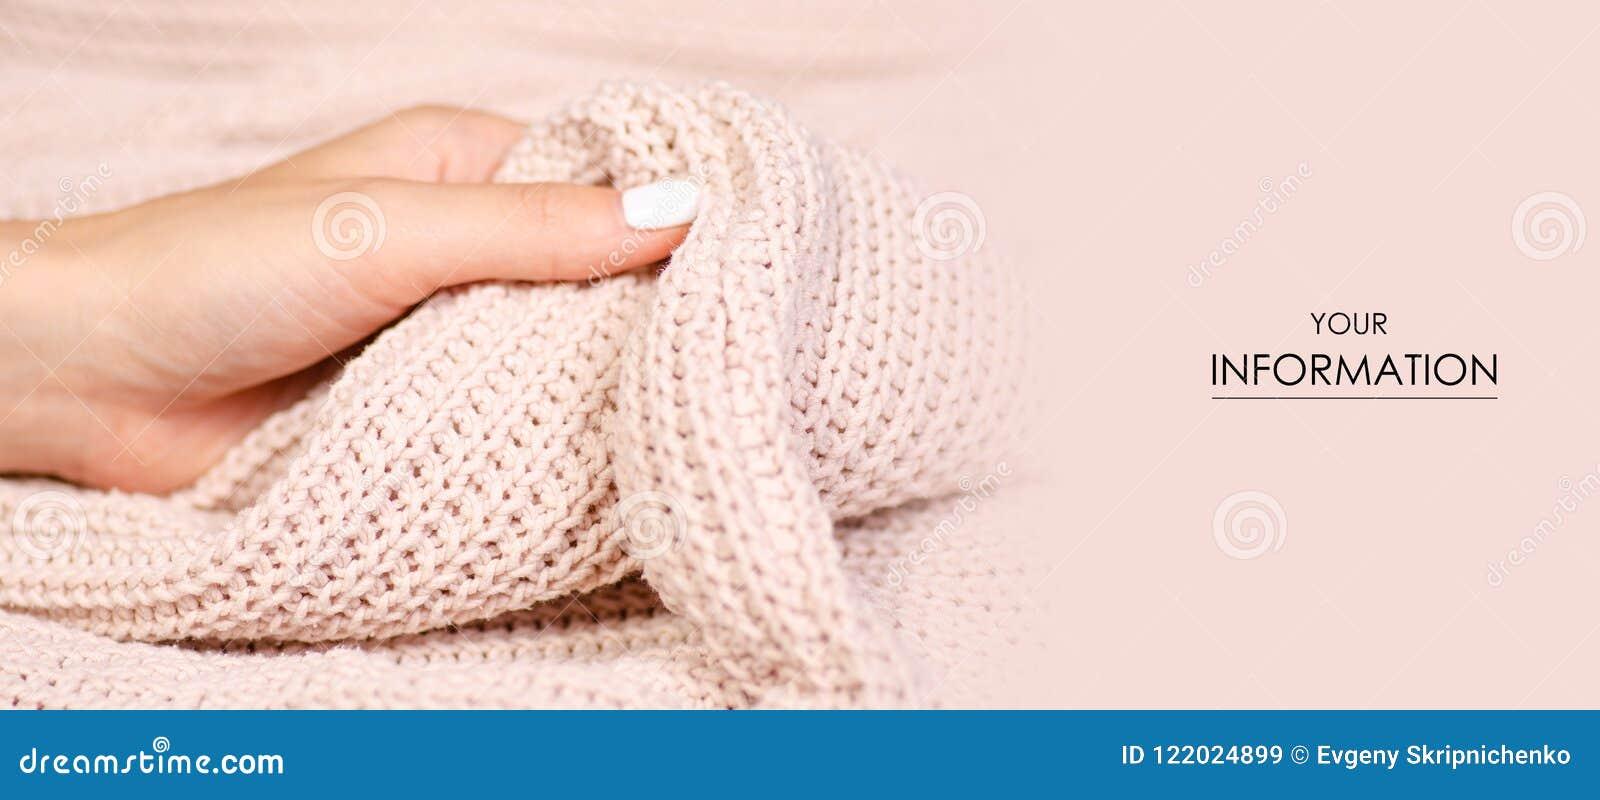 e75a79cc3264 Μπεζ πλεκτό πουλόβερ σύστασης μακρο σχέδιο χεριών υφάσματος υφαντικό θηλυκό